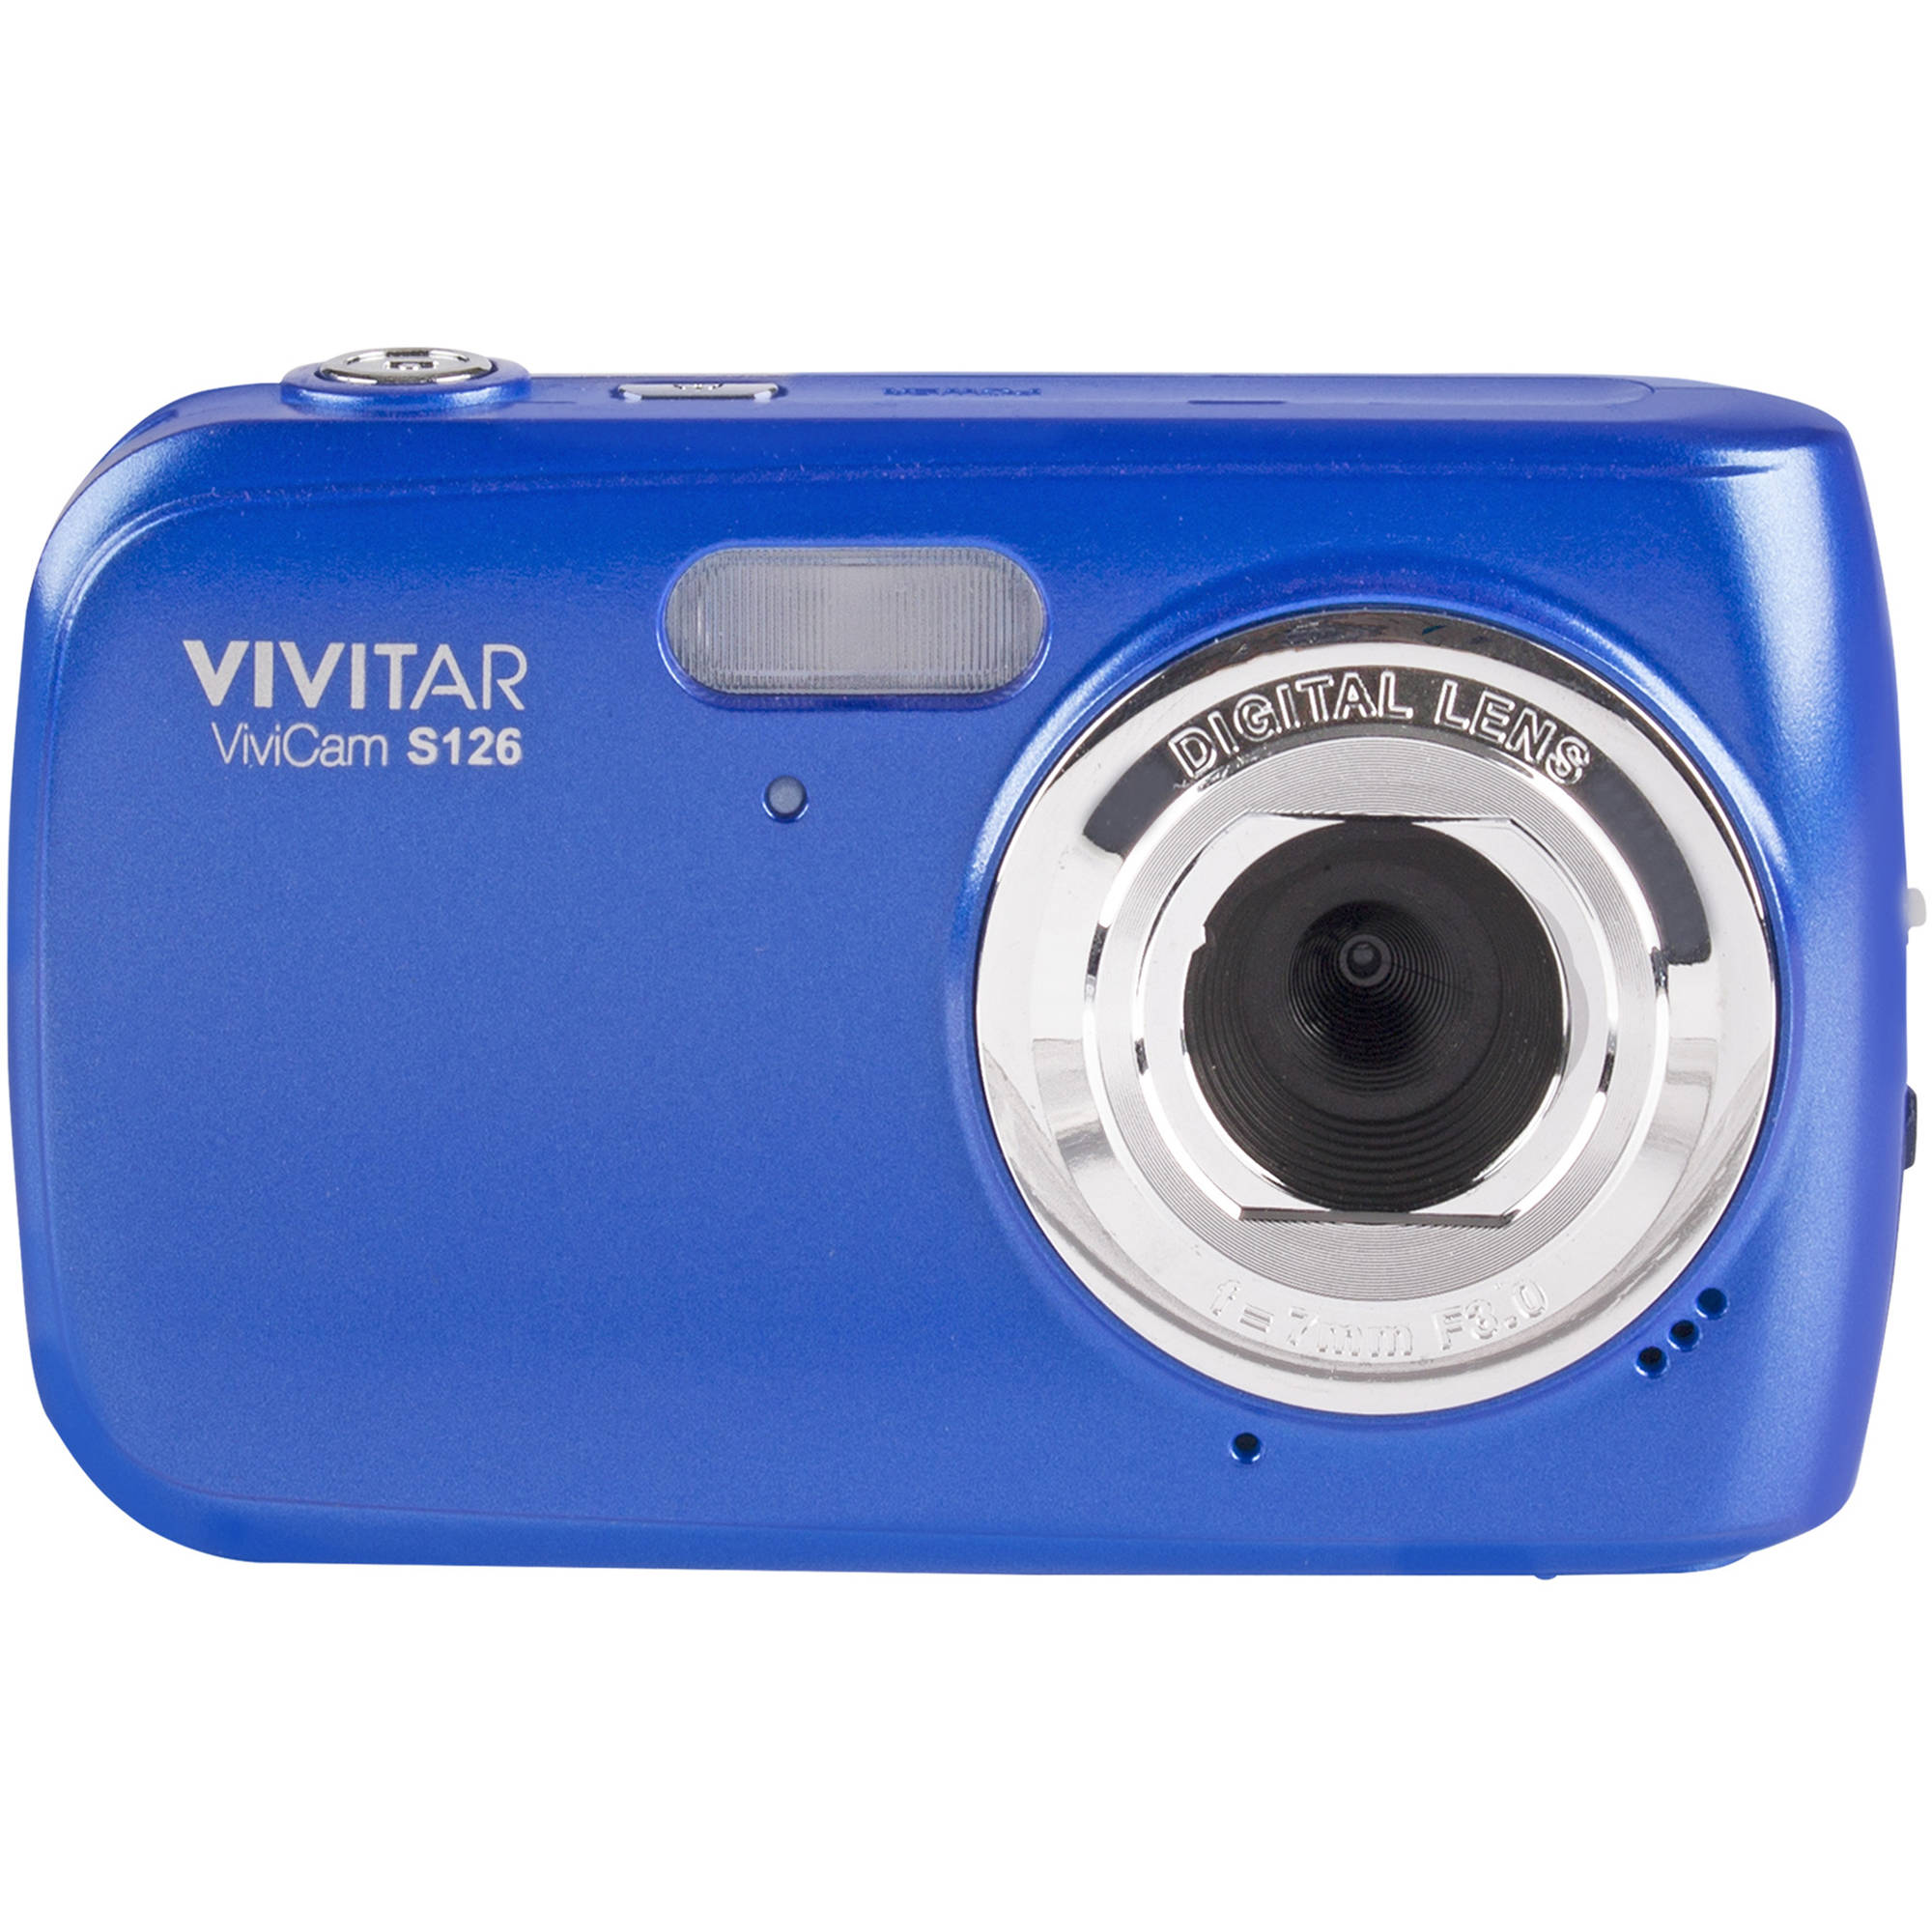 VIVITAR DIGITAL CAMERA DRIVERS FOR WINDOWS 10